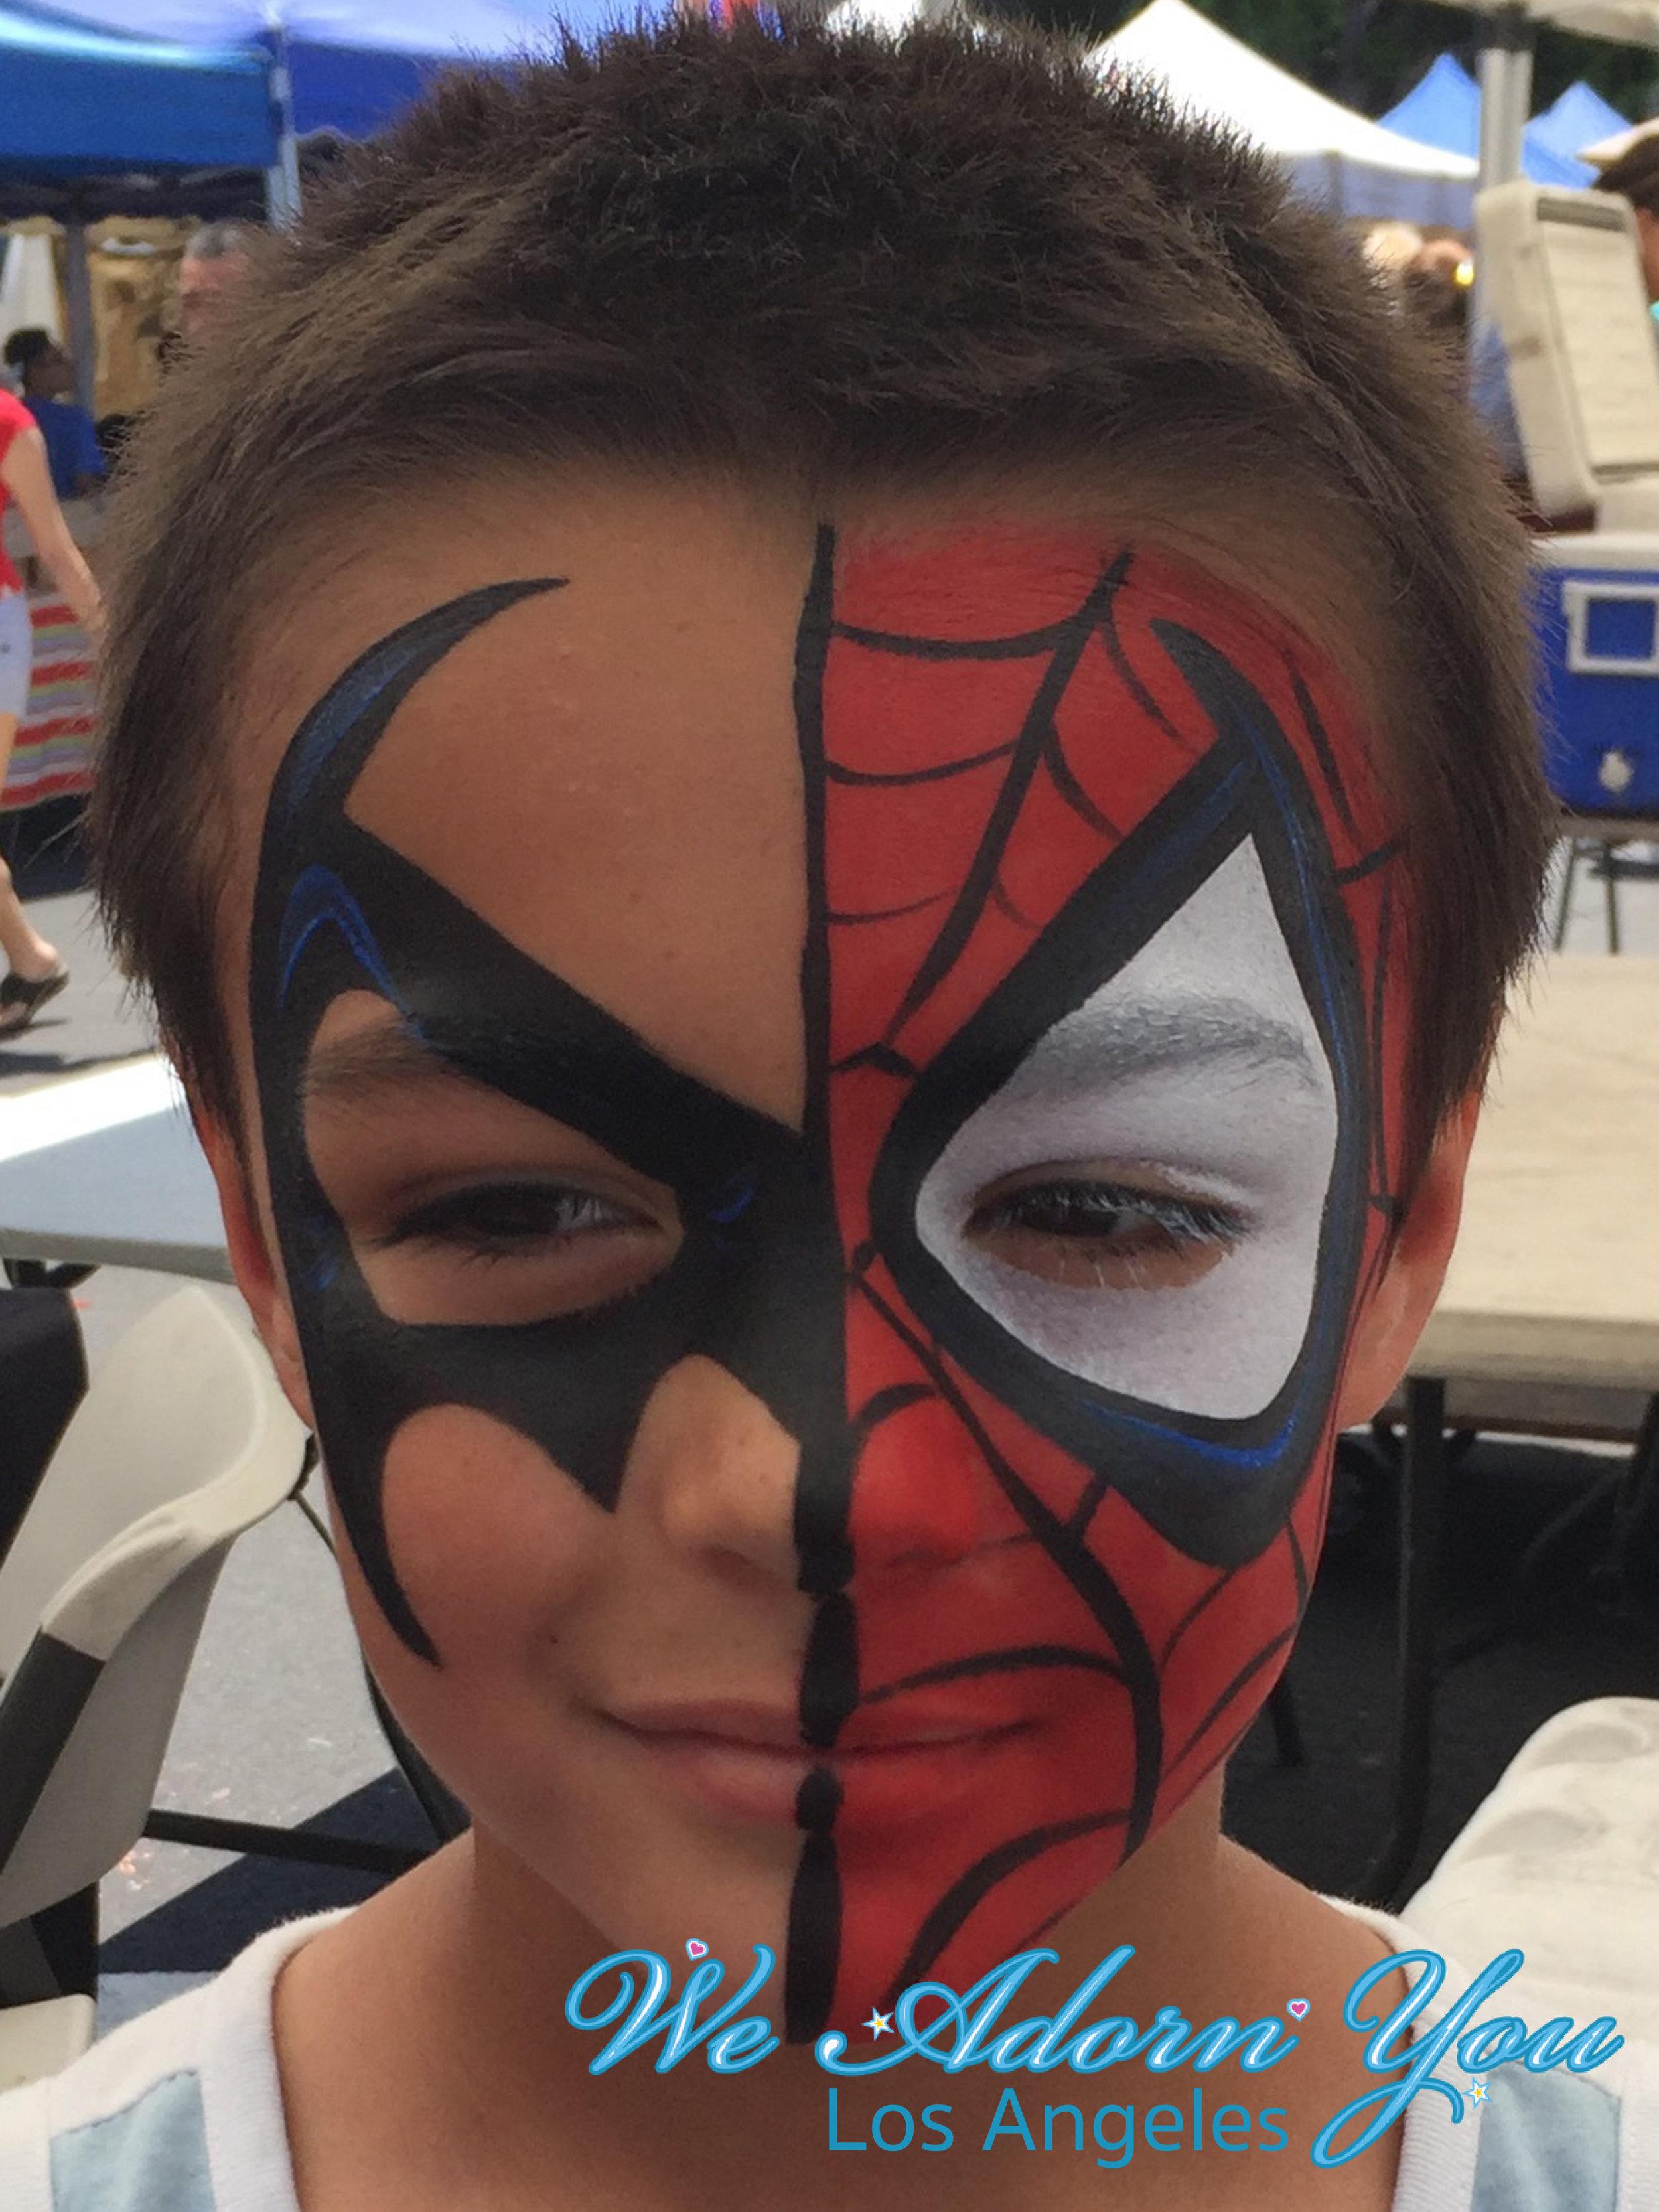 We Adorn You Los Angeles Face Painting Batman Spiderman.jpg